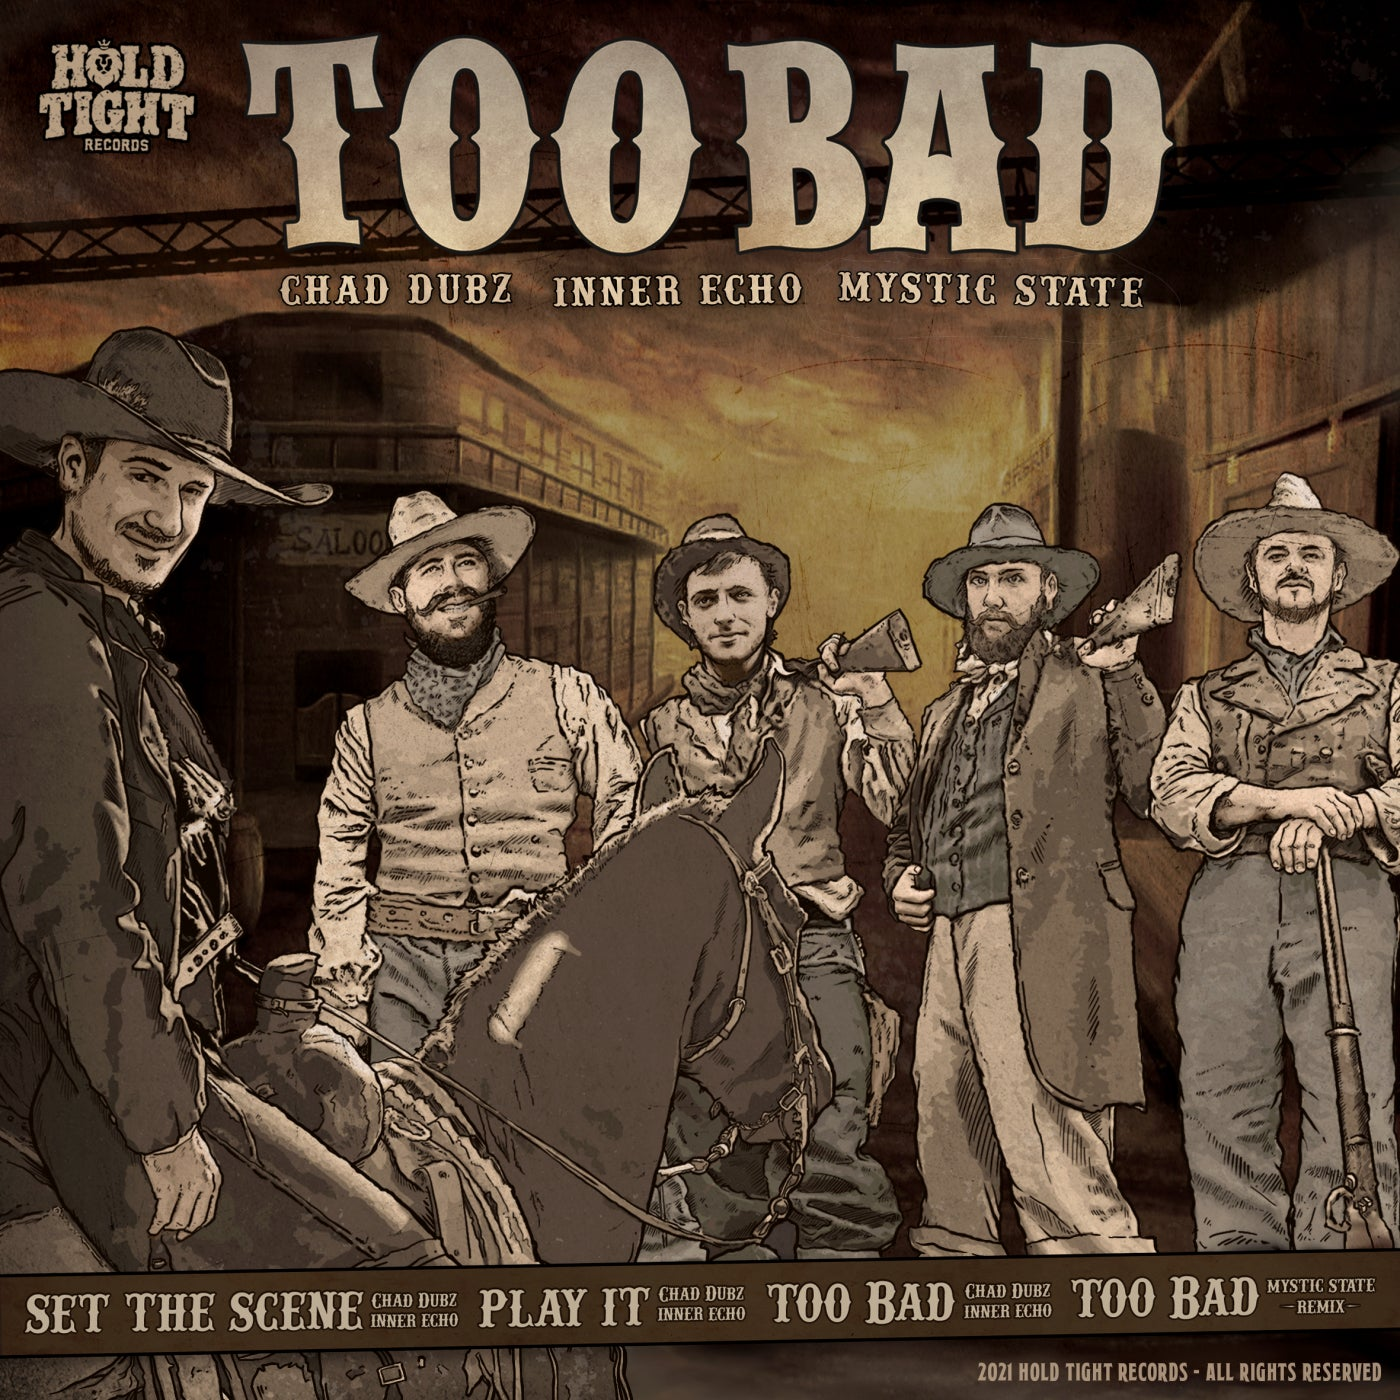 Too Bad (Mystic State Remix)